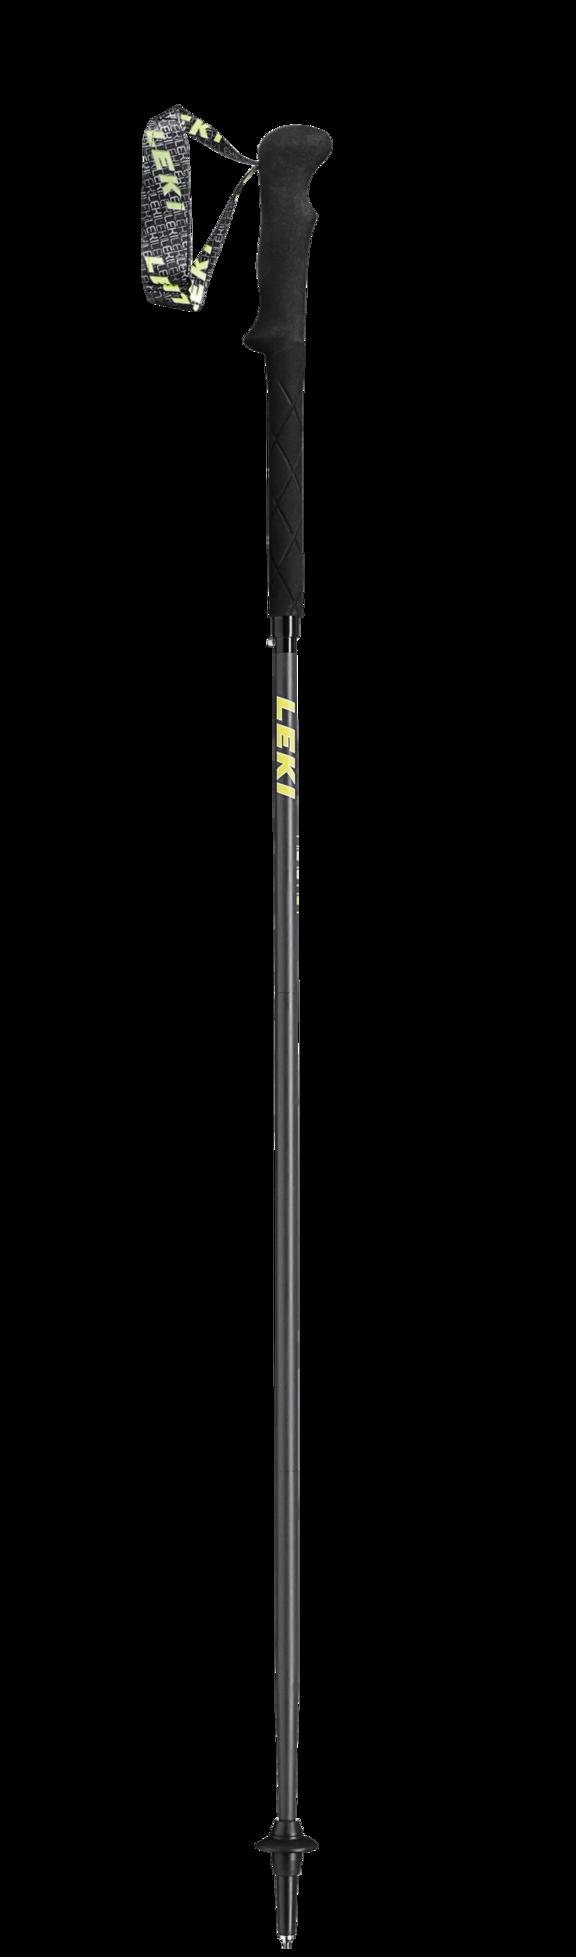 Треккинговые палки Leki Micro RCM NW Faltstock